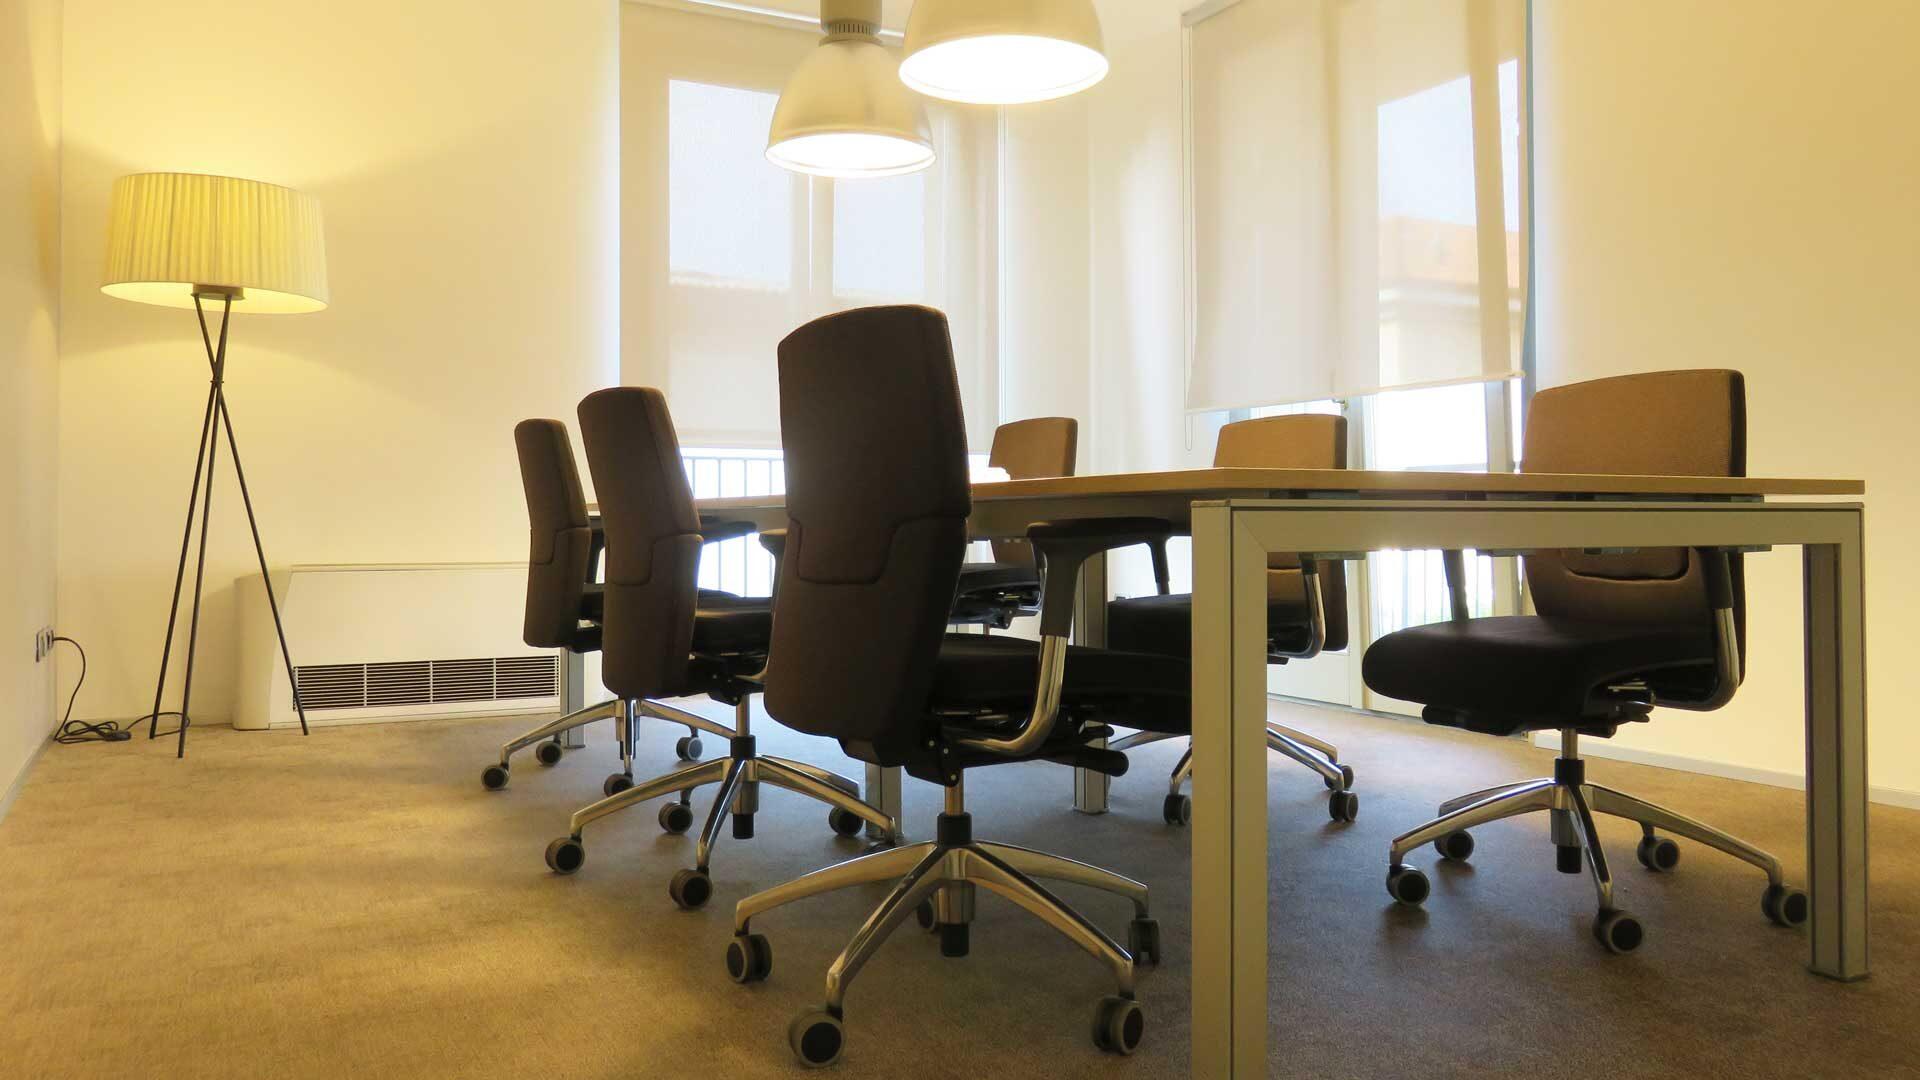 Come-arredare-studio-commercialista-Level-Office-Landscape-Office-Landscape